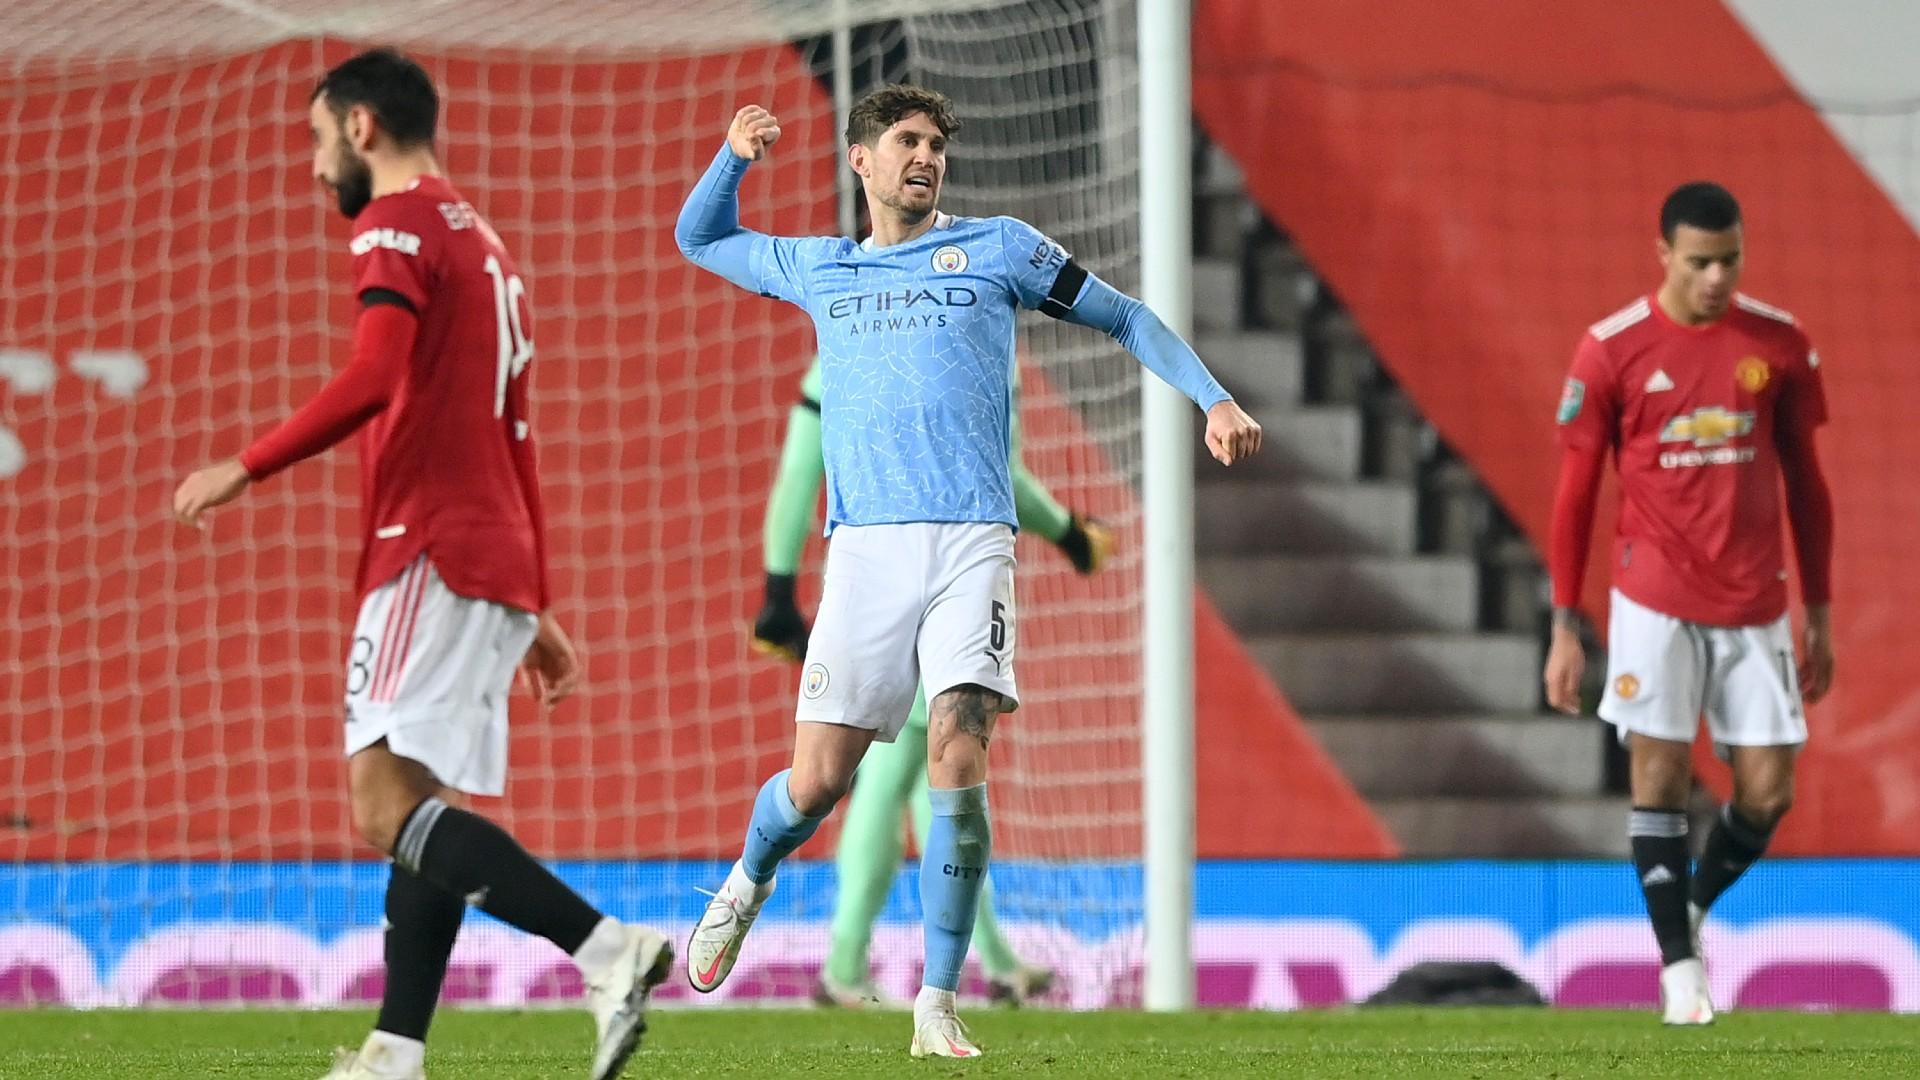 Man City aren't stronger than Man Utd - Nani hopeful ahead of derby